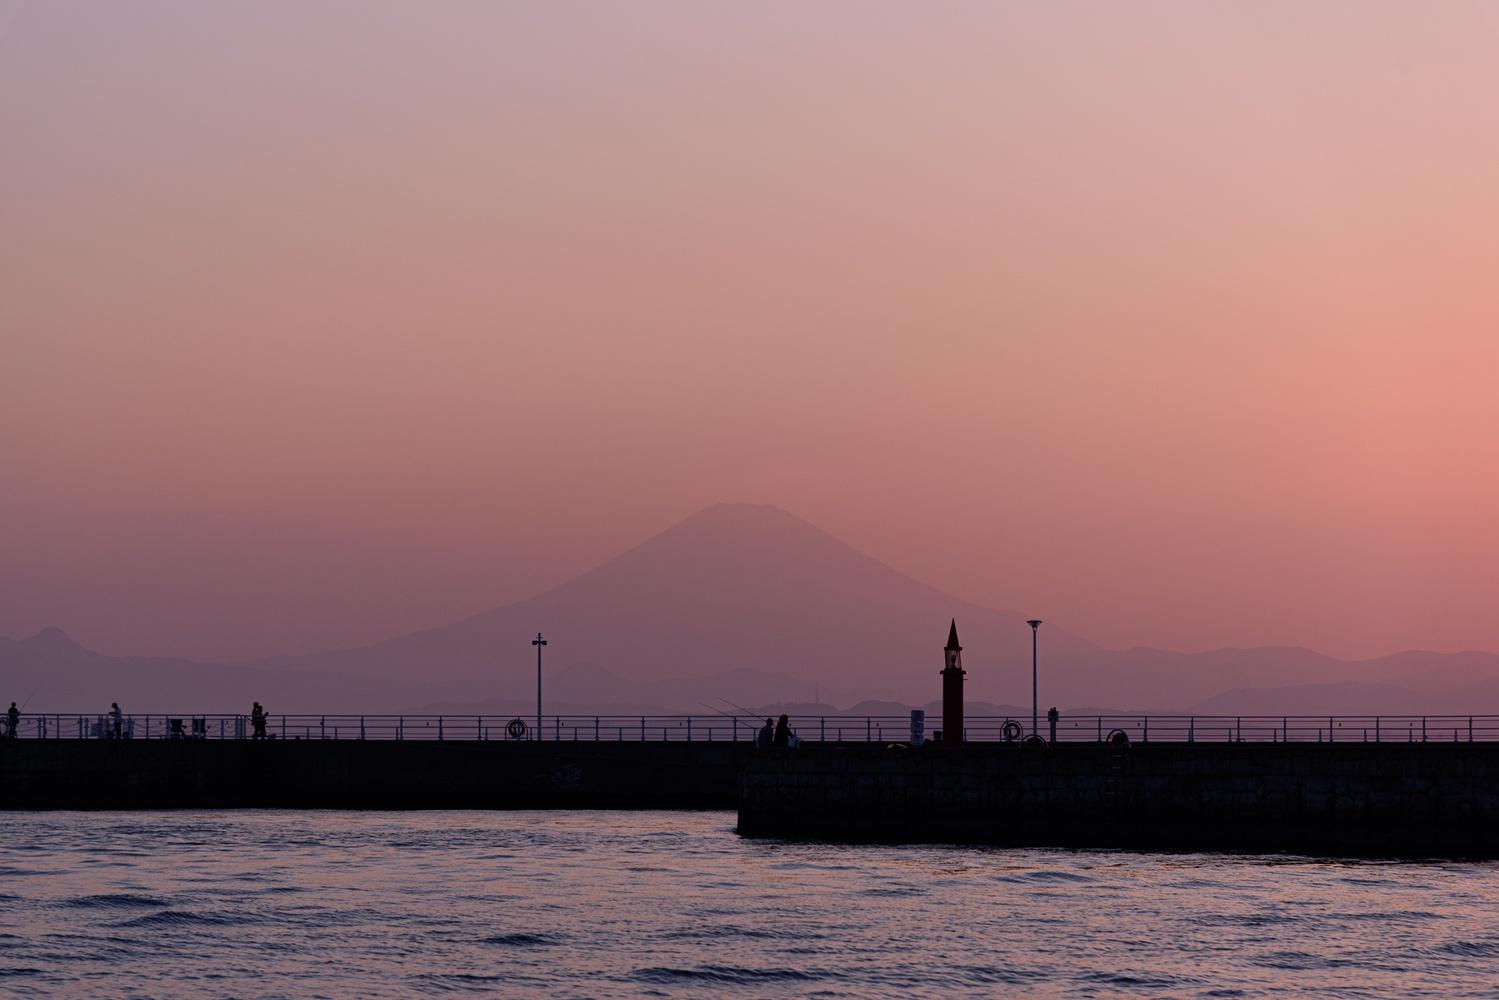 Mirrage of Mt.Fuji by Masataka Inada